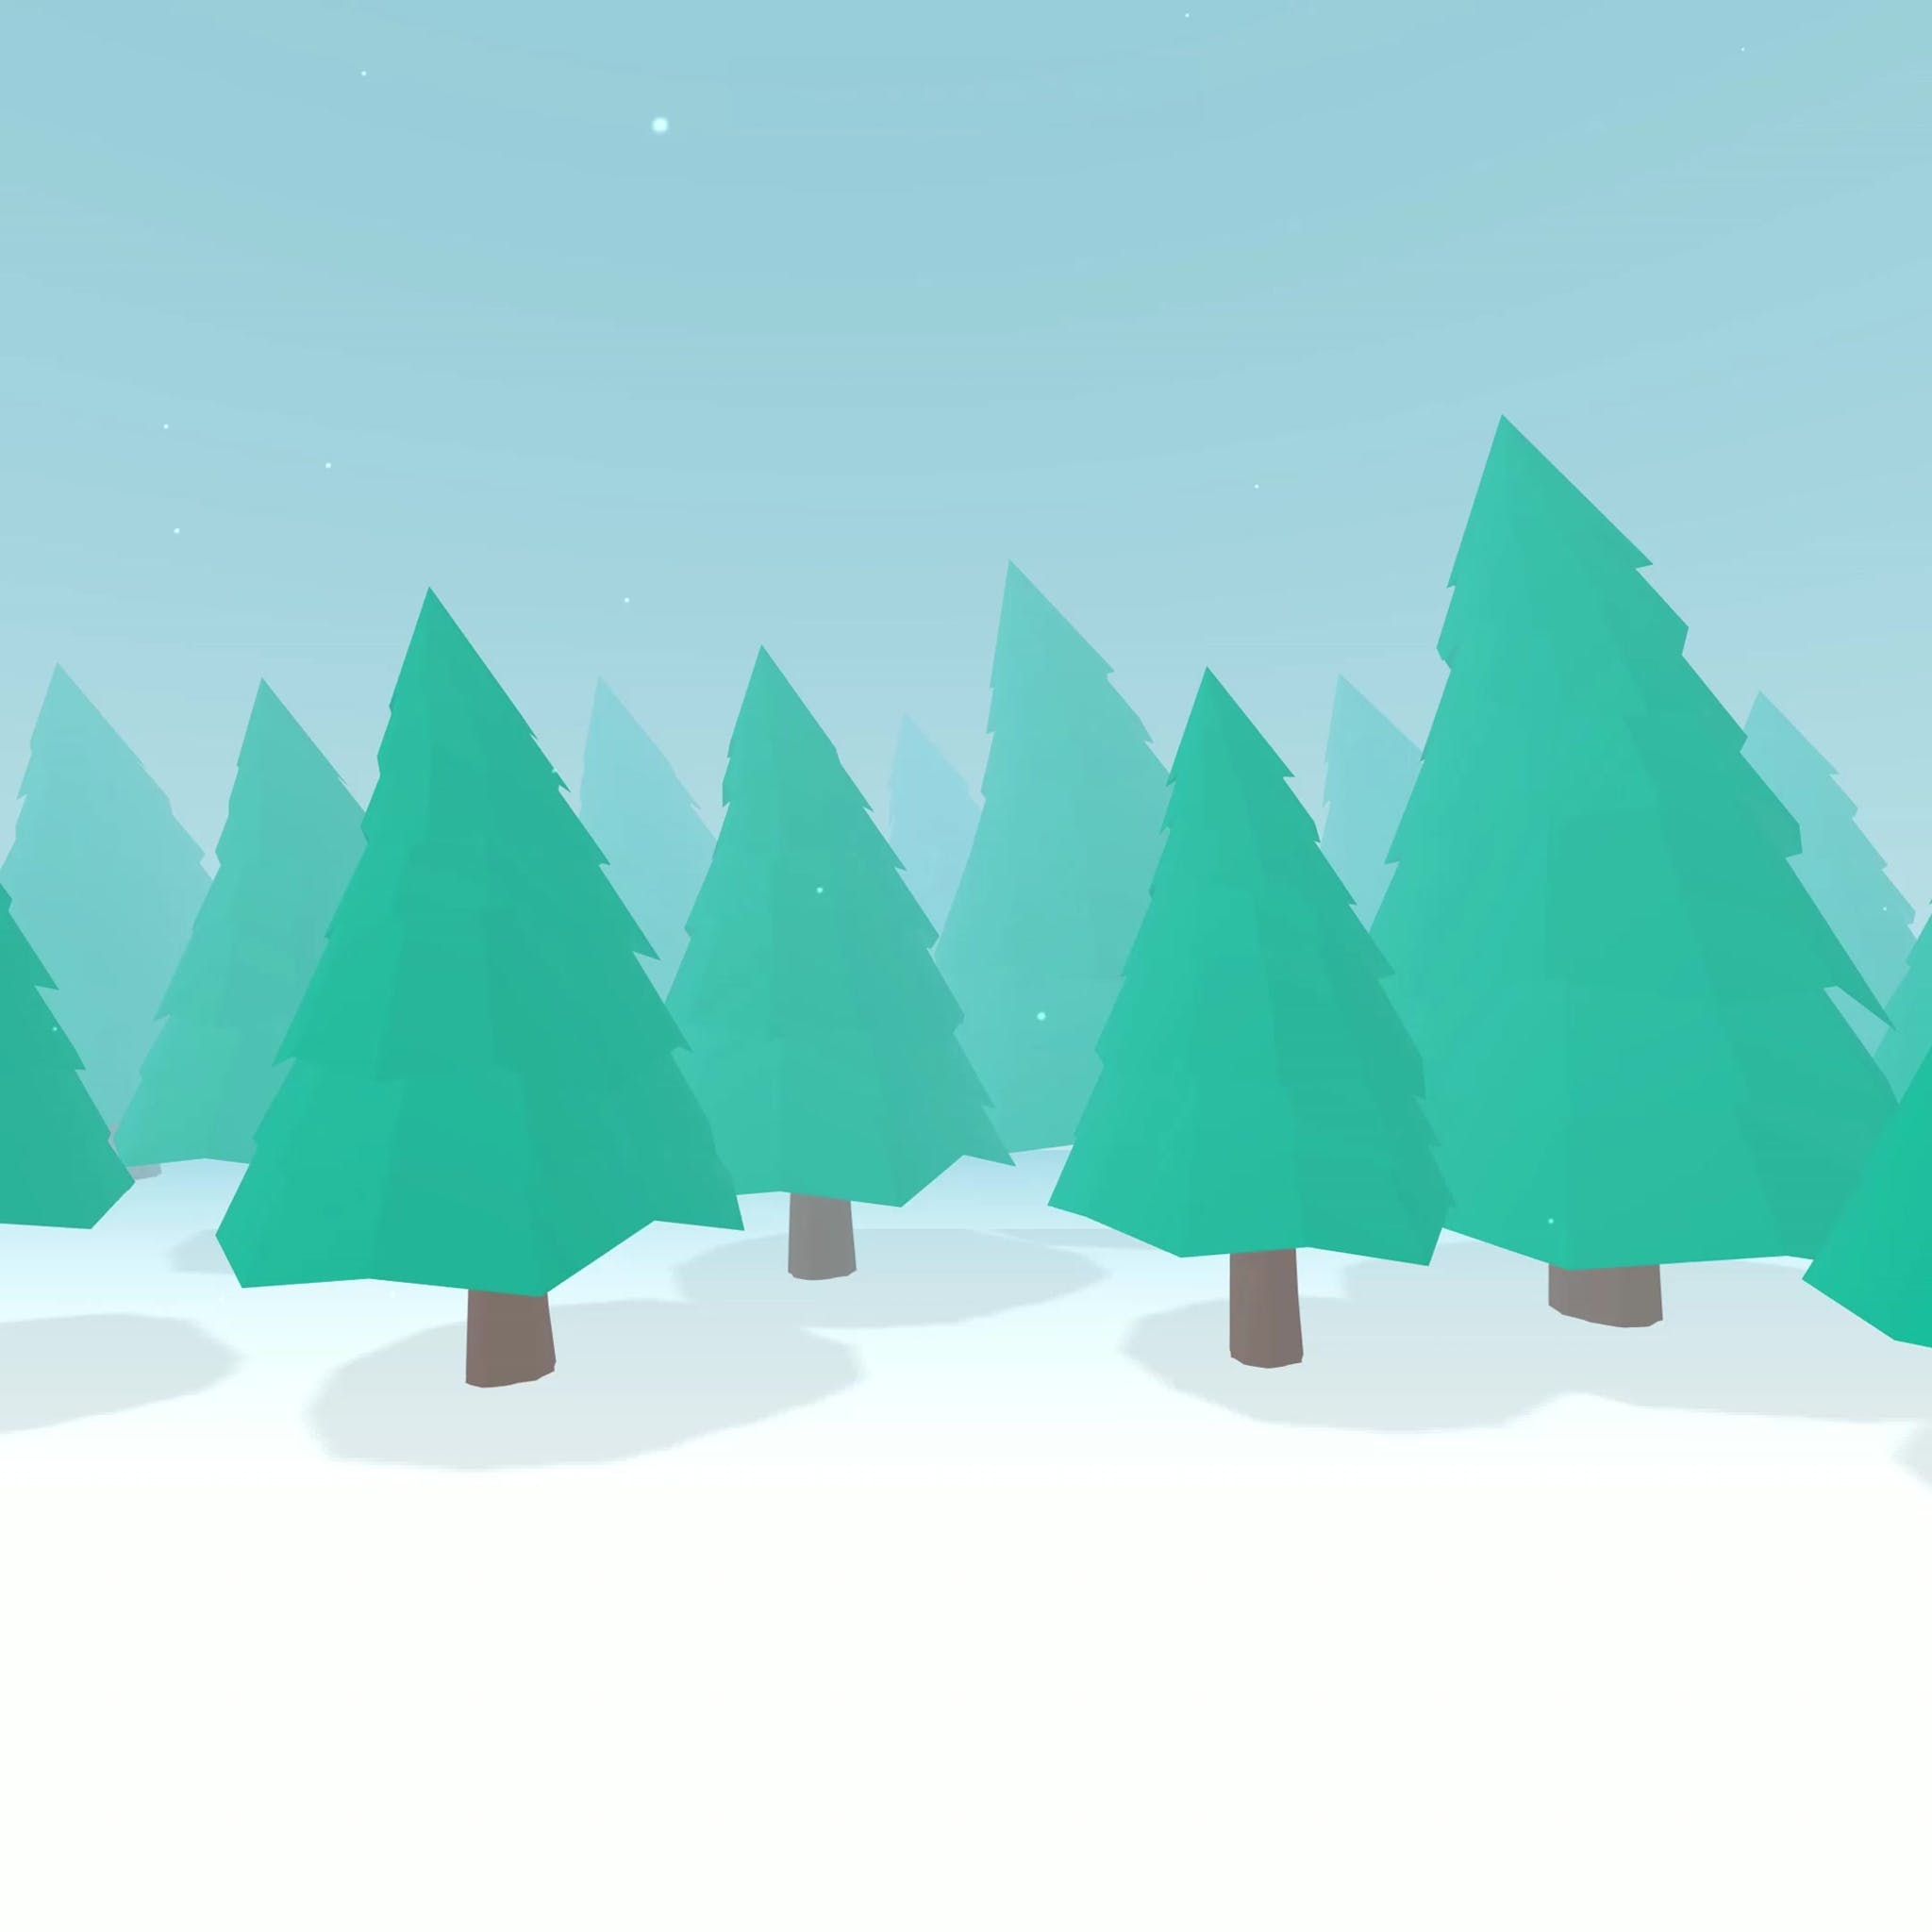 Trees that keep swinging